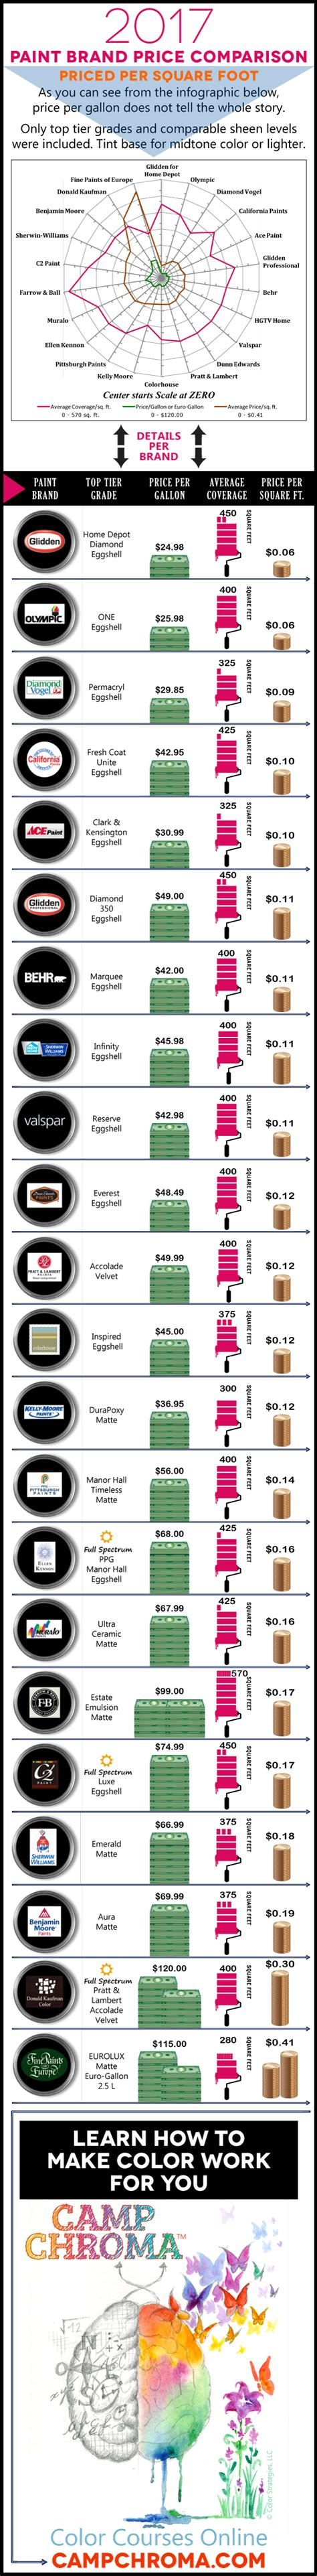 paint price comparison 2017 infographic includes 22 major brands